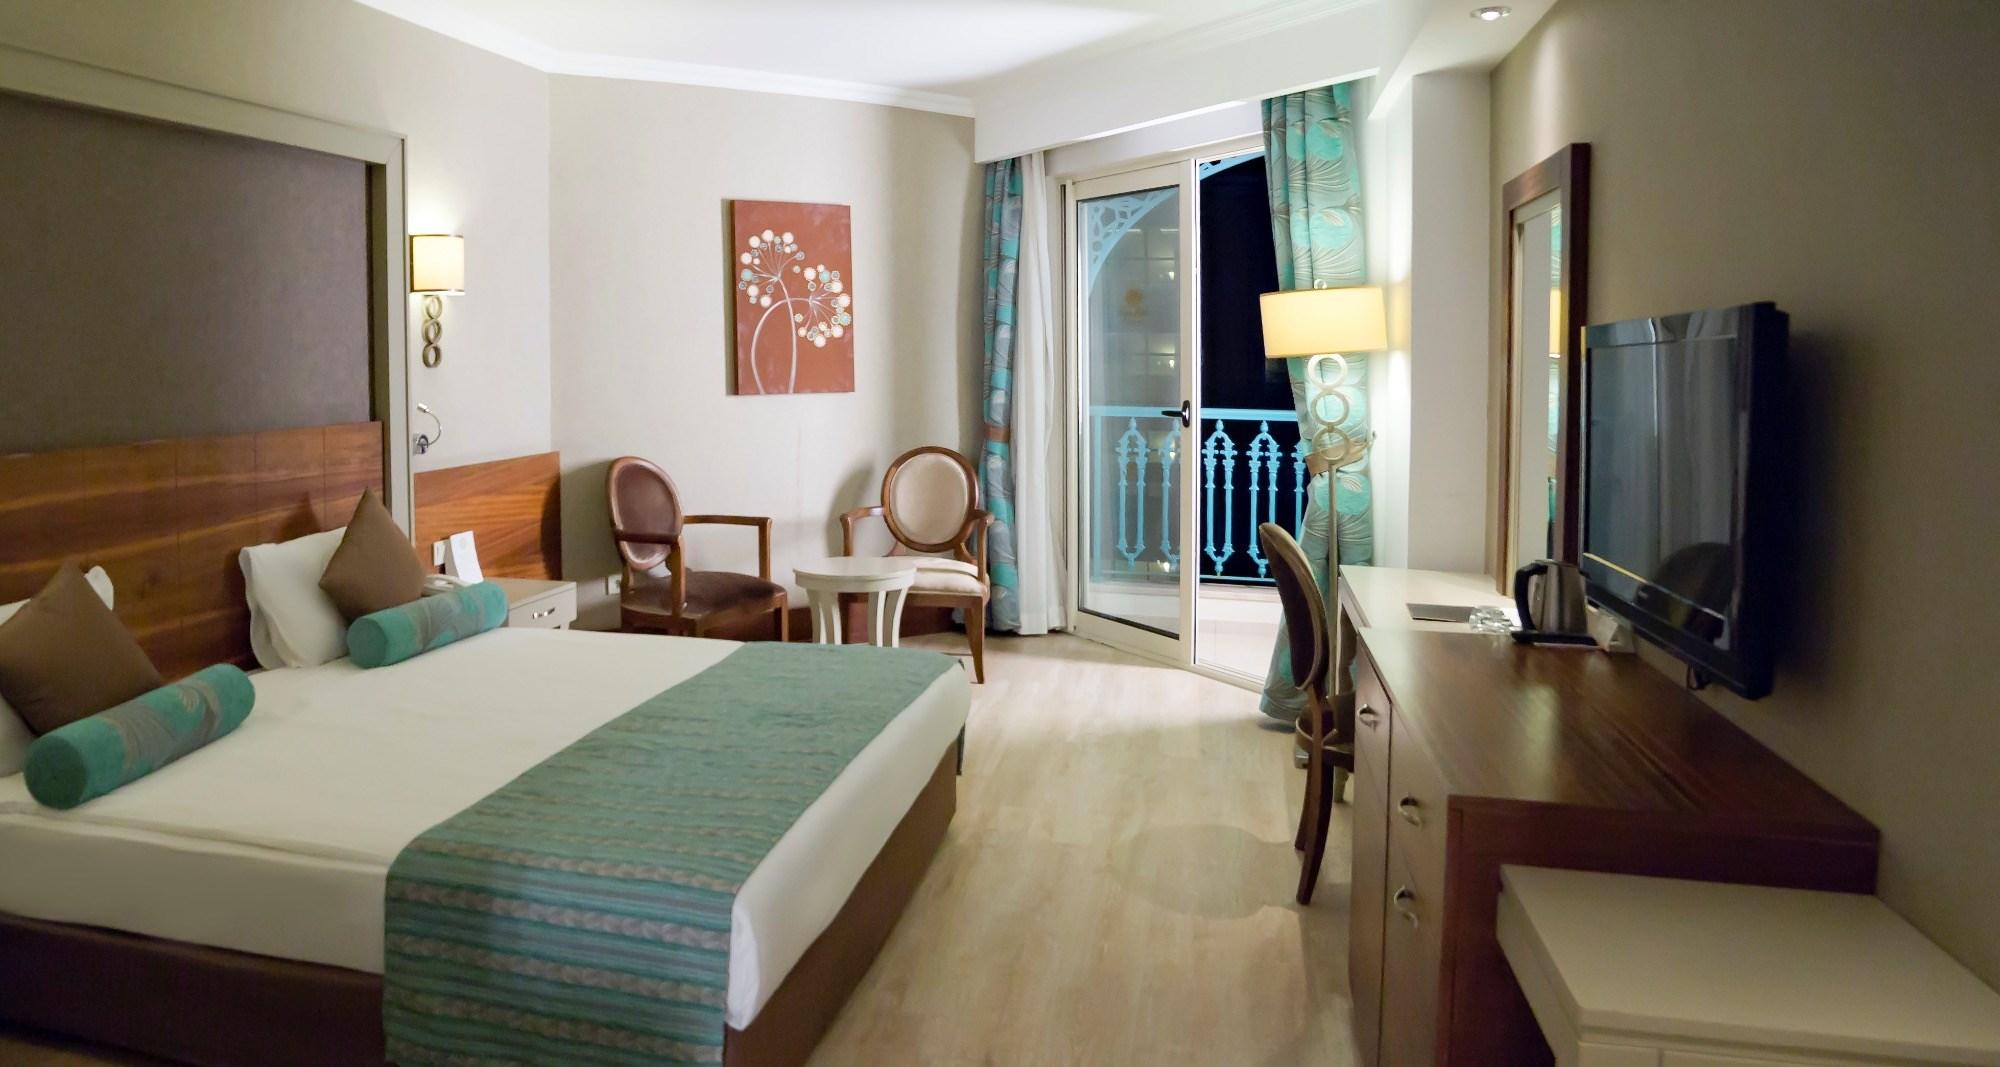 http://www.orextravel.sk/OREX/hotelphotos/side-crown-palace-general-114392.jpg